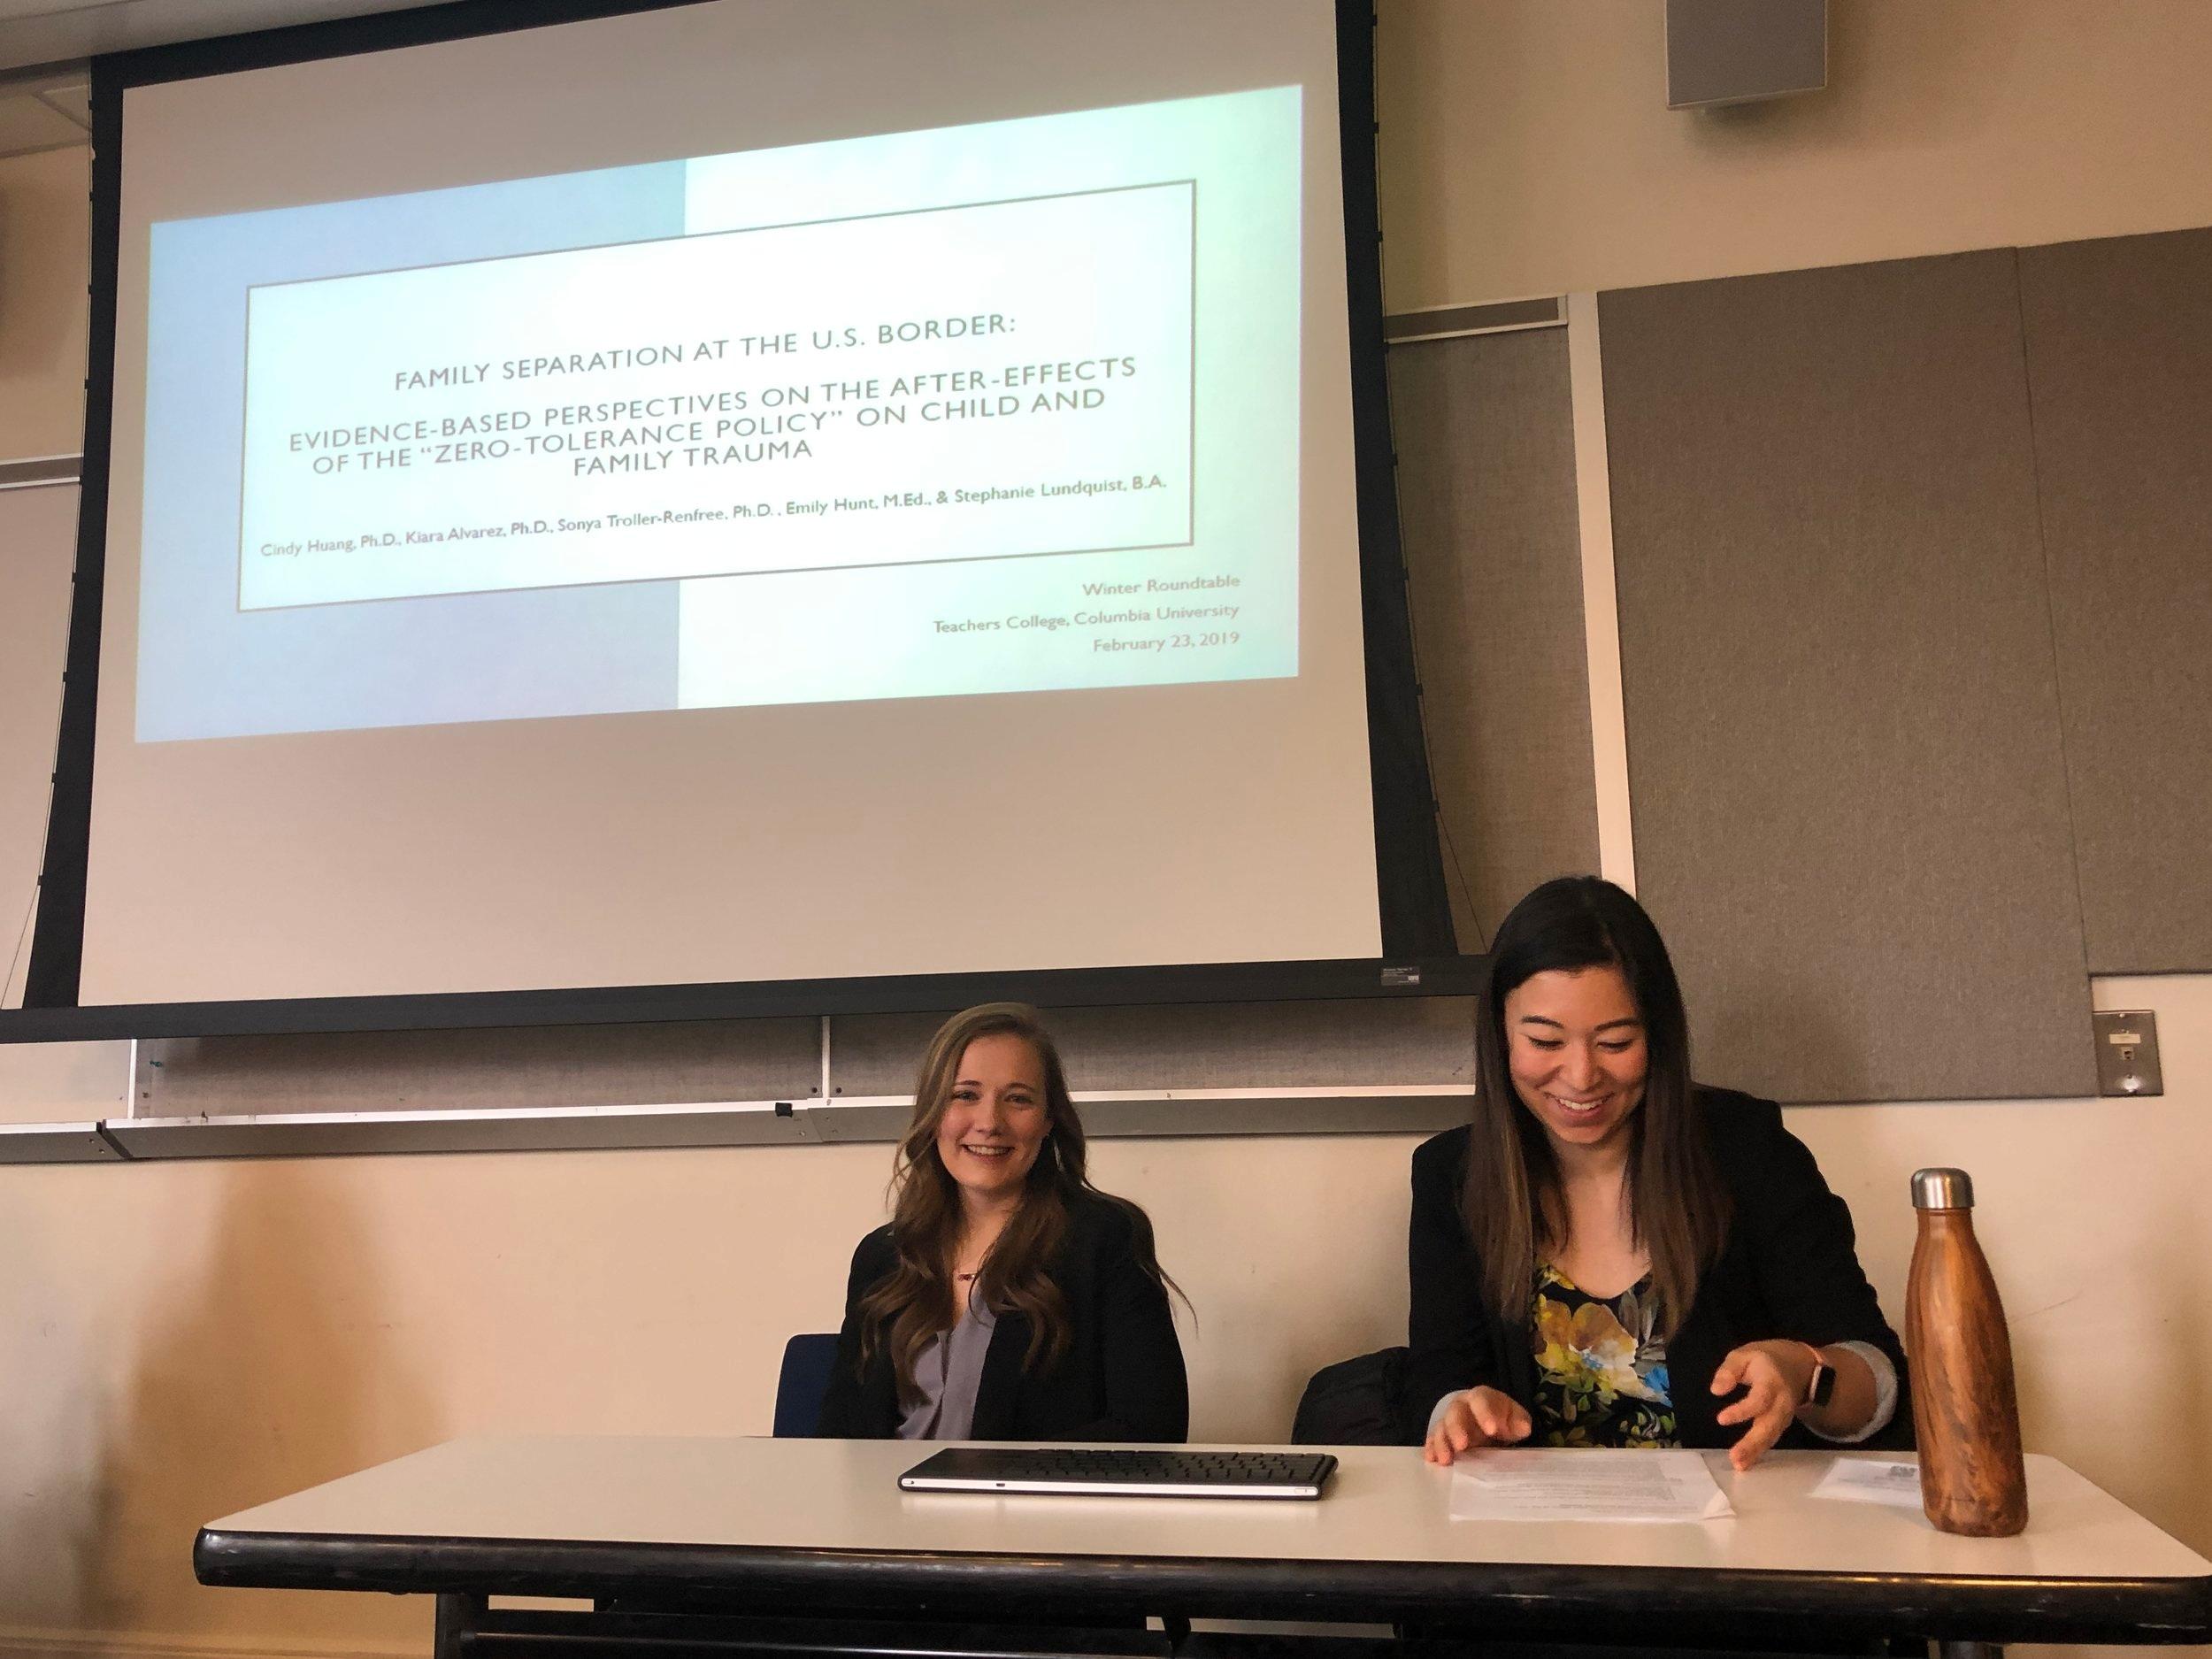 """Family Separation at the U.S. Border"" - — Stephanie L. and Emily H. facilitating Dr. Cindy Huang and Dr. Kiara Alvarez's symposium."